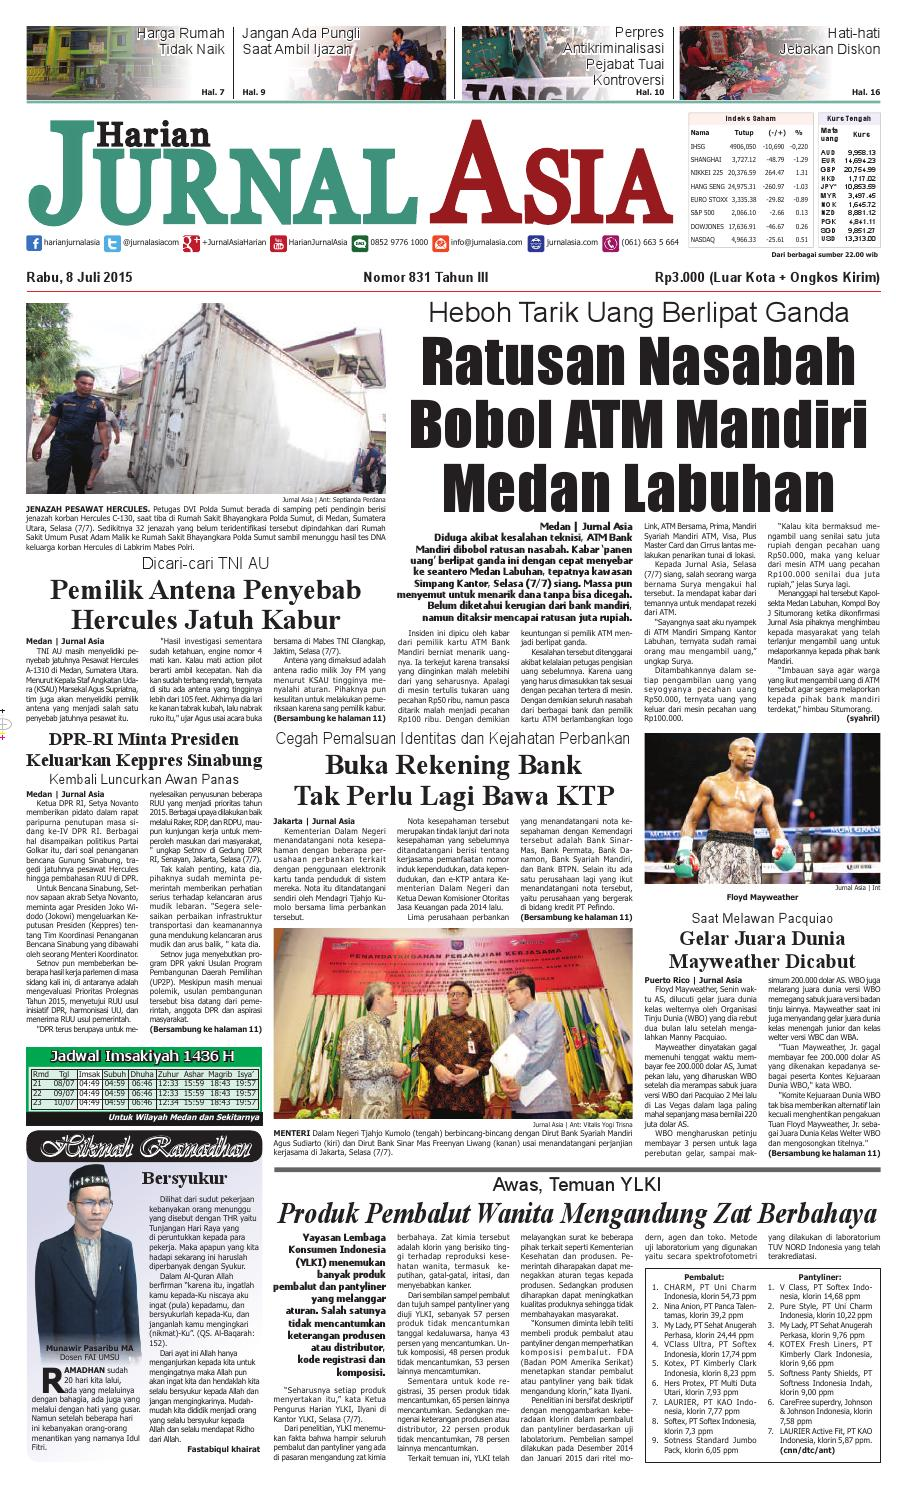 harian jurnal asia edisi rabu, 08 juli 2015 by harian jurnal asiaharian jurnal asia edisi rabu, 08 juli 2015 by harian jurnal asia medan issuu